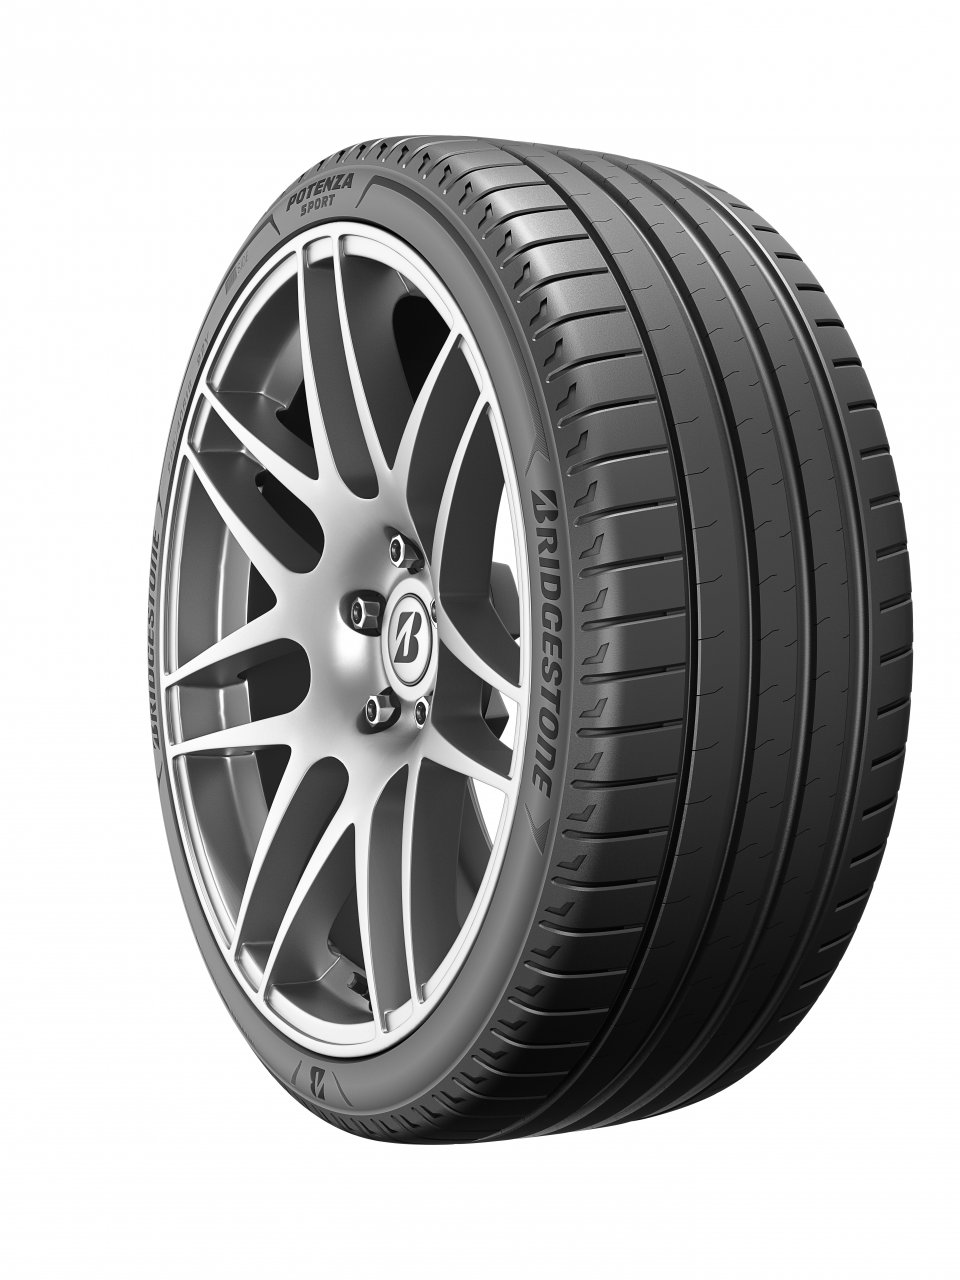 Bridgestone, Bridgestone unveils new generation of ultra-high-performance tires, ClassicCars.com Journal